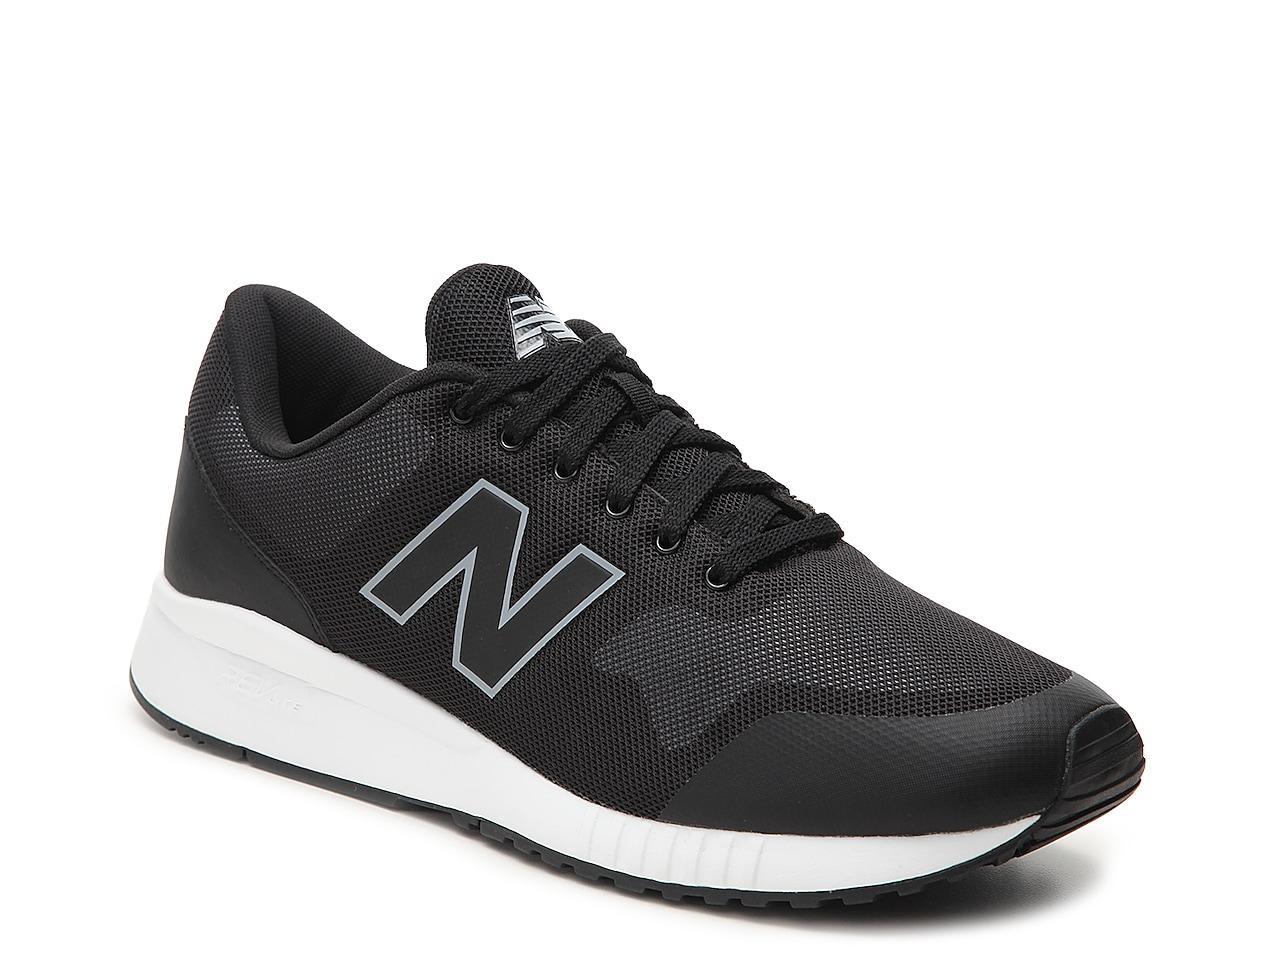 New Balance 005 Sneaker - Men's | DSW